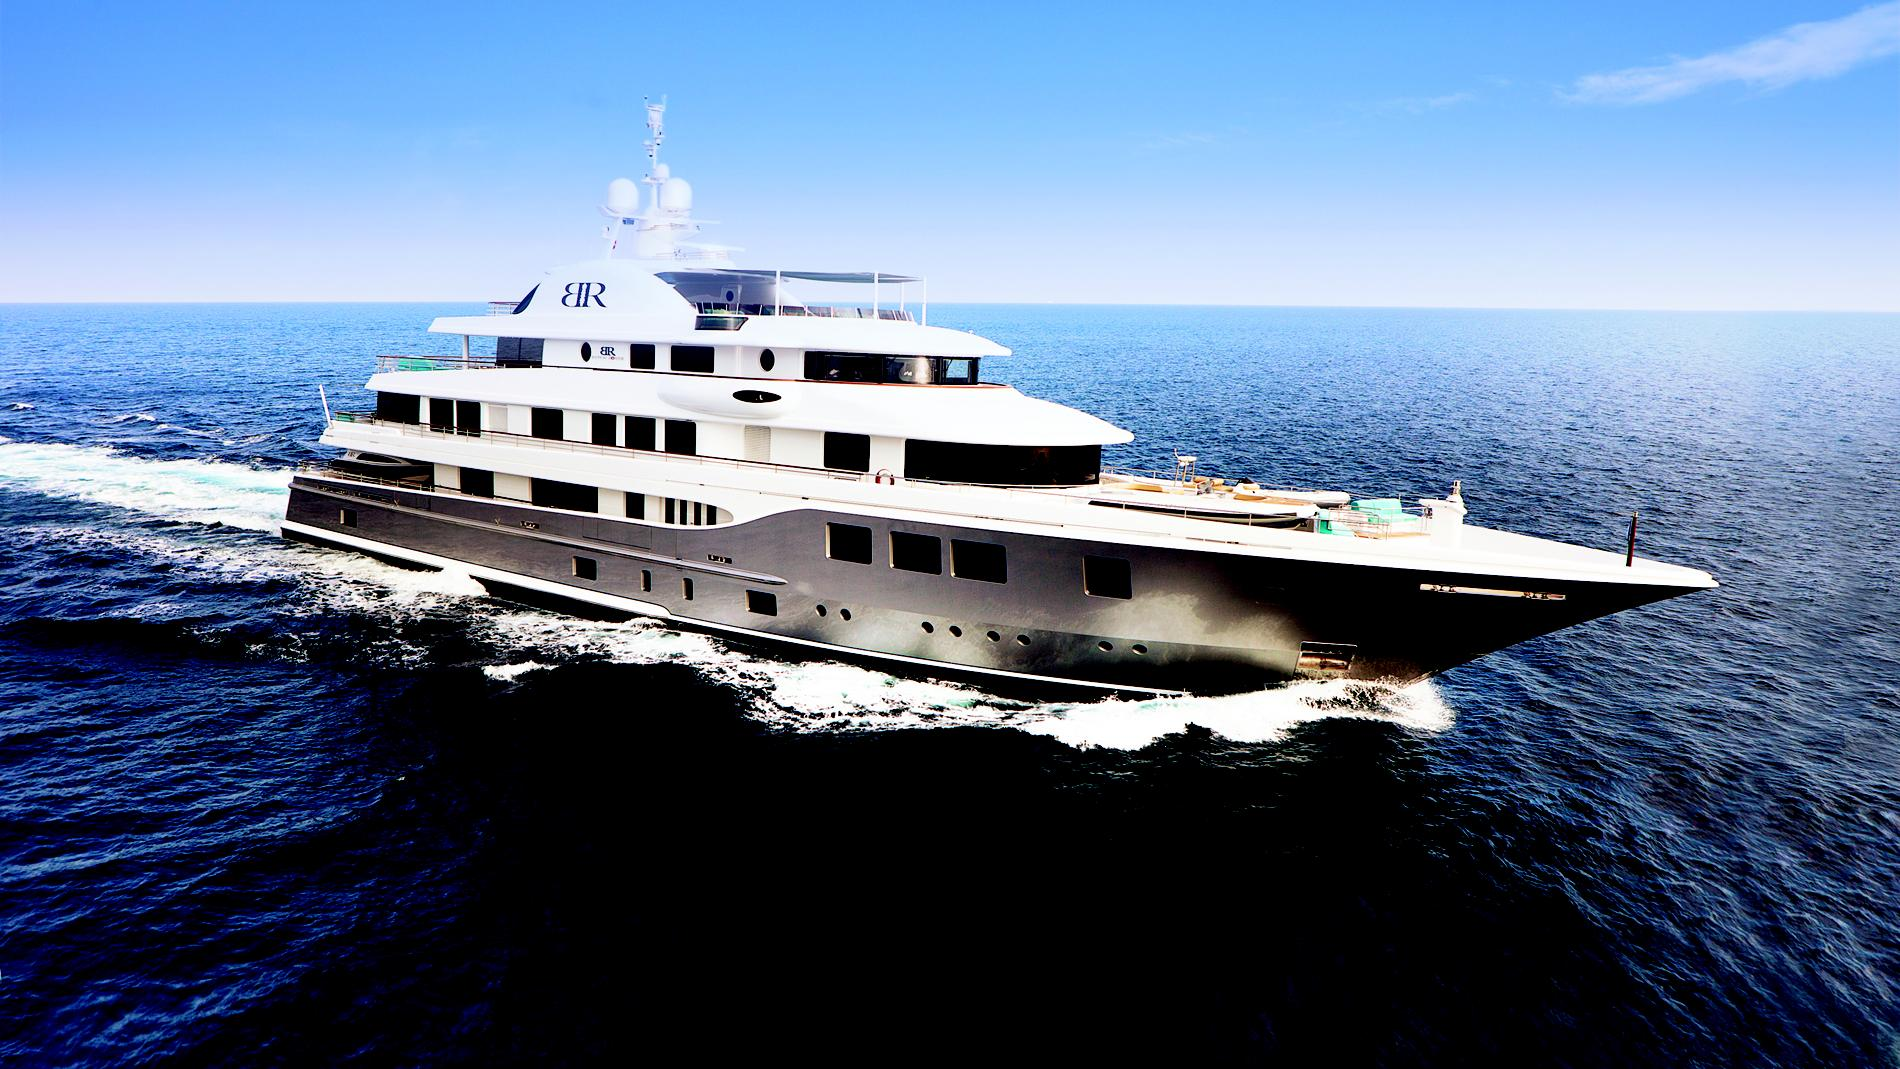 baton-rouge-yacht-for-sale-profile